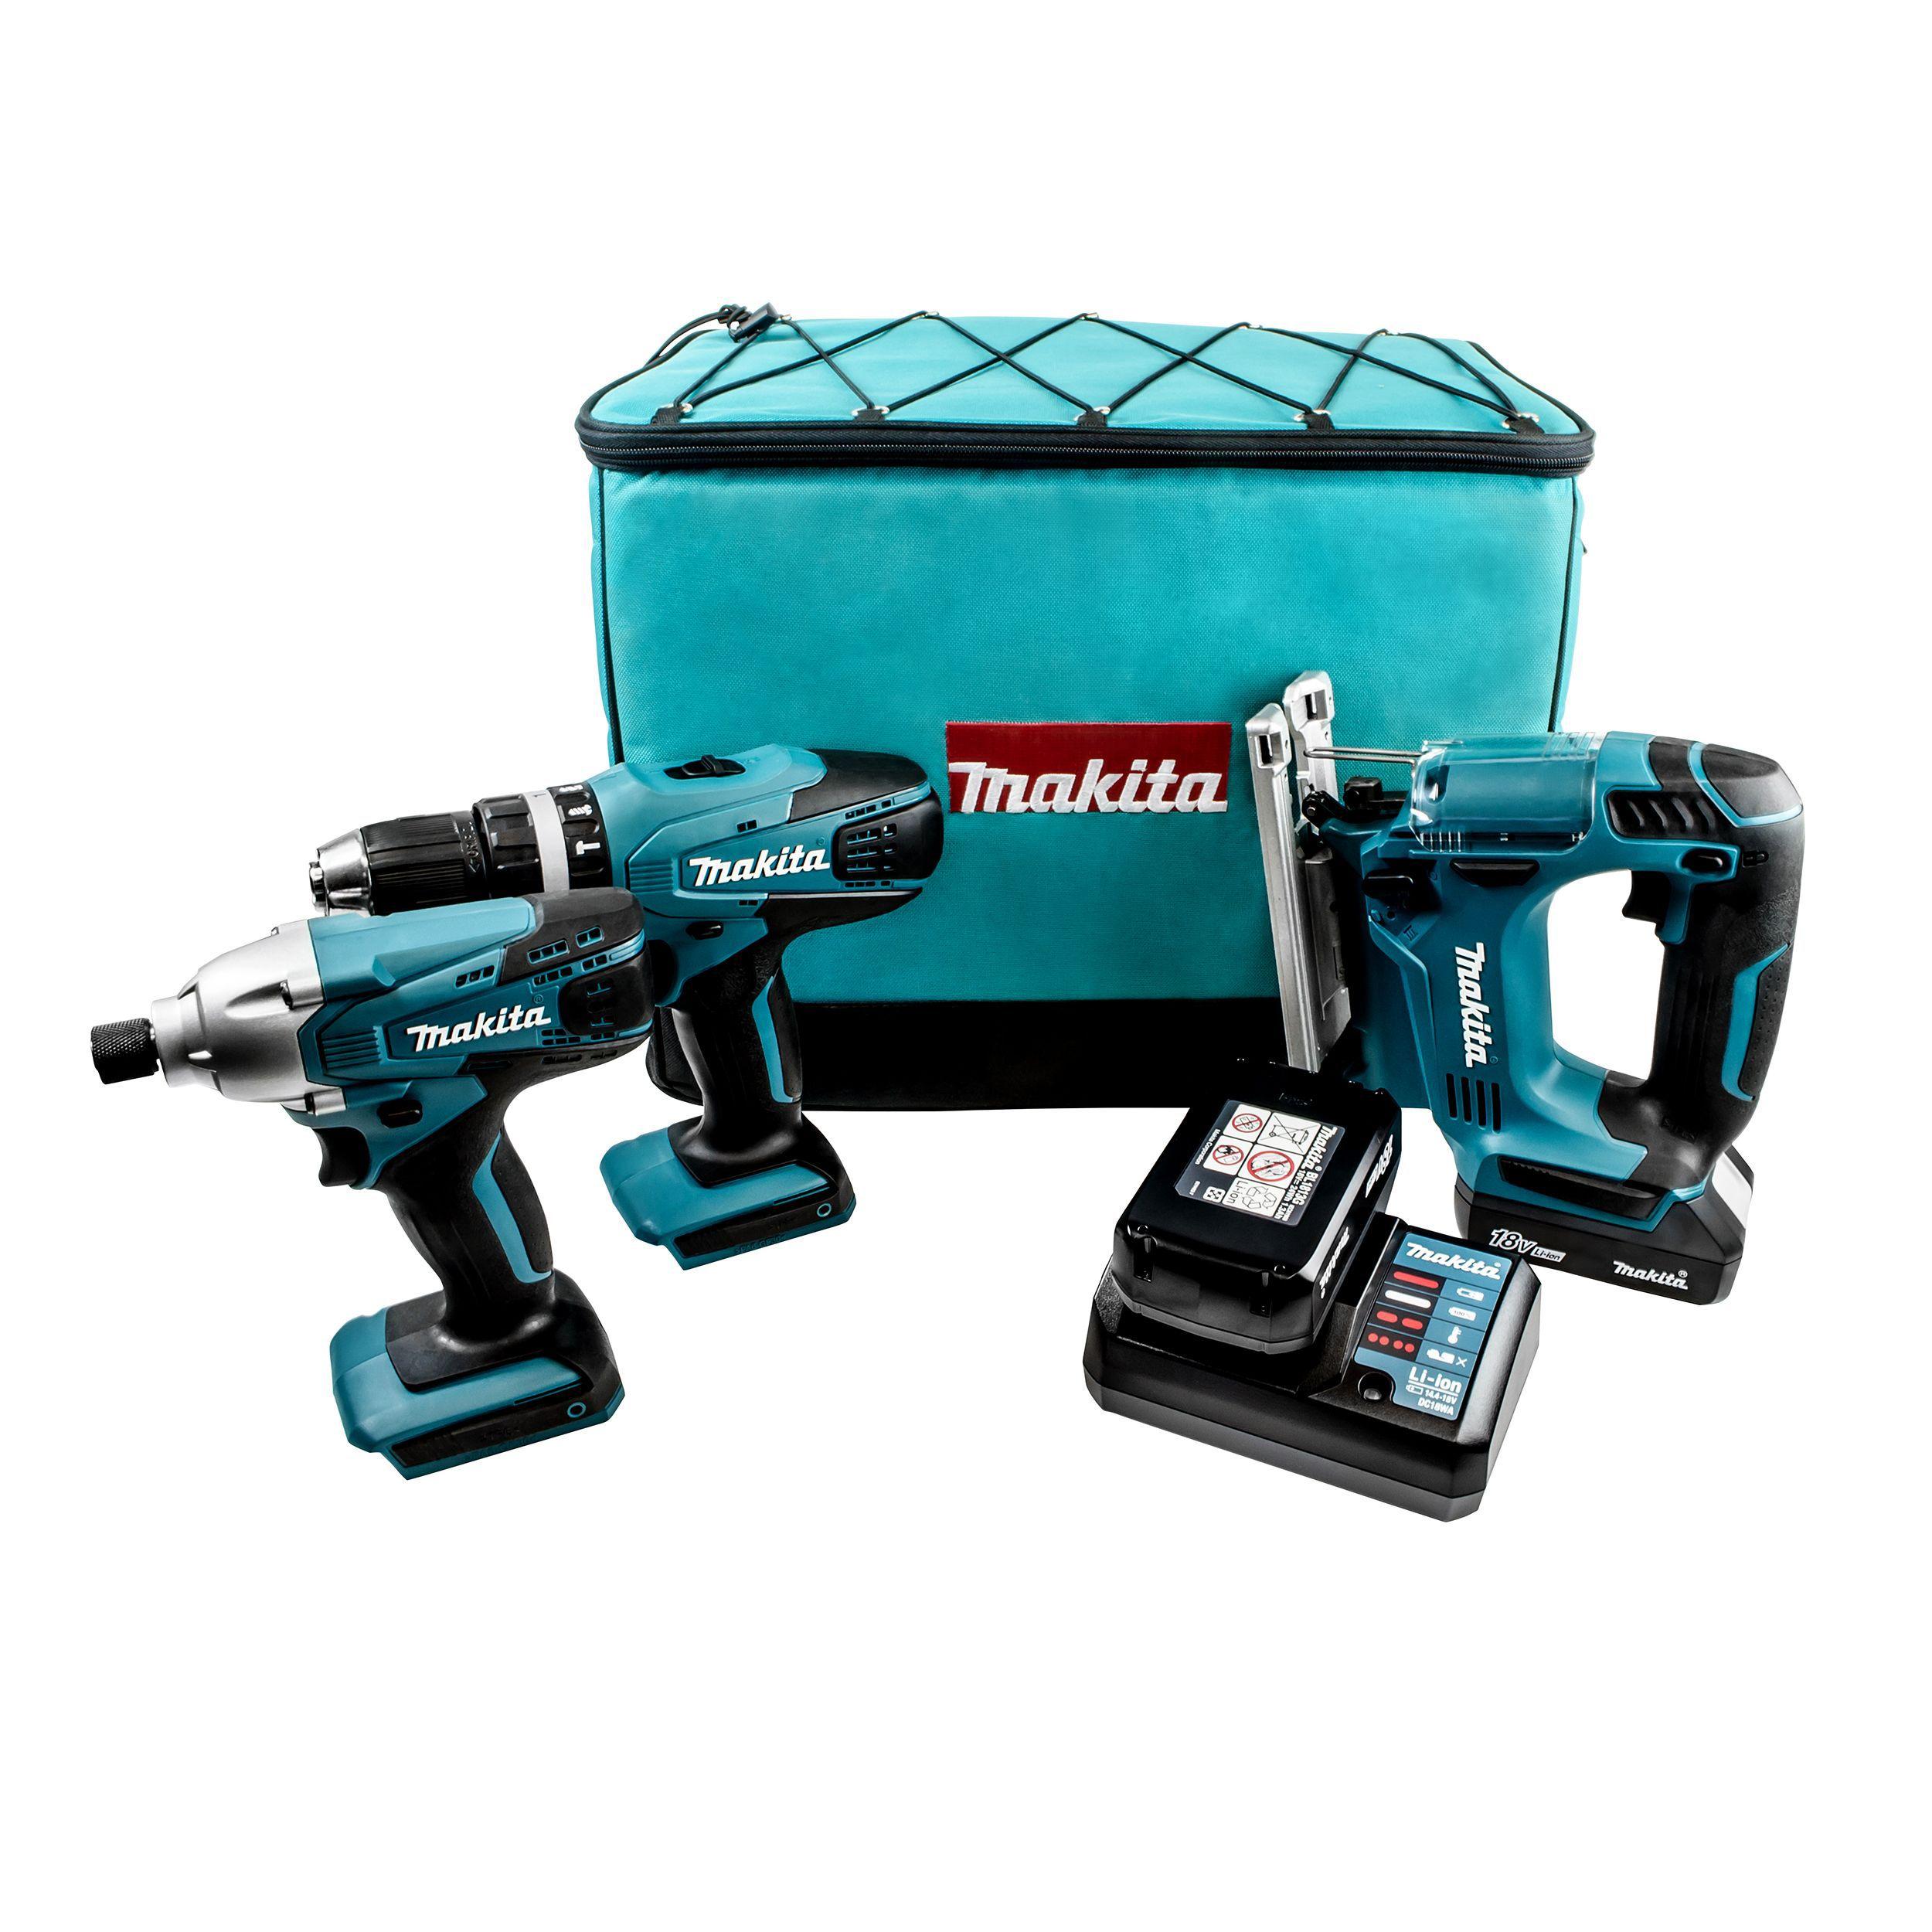 Makita G-series Cordless 18v 1.3ah Piece Power Tool Triple Kit Dk18267